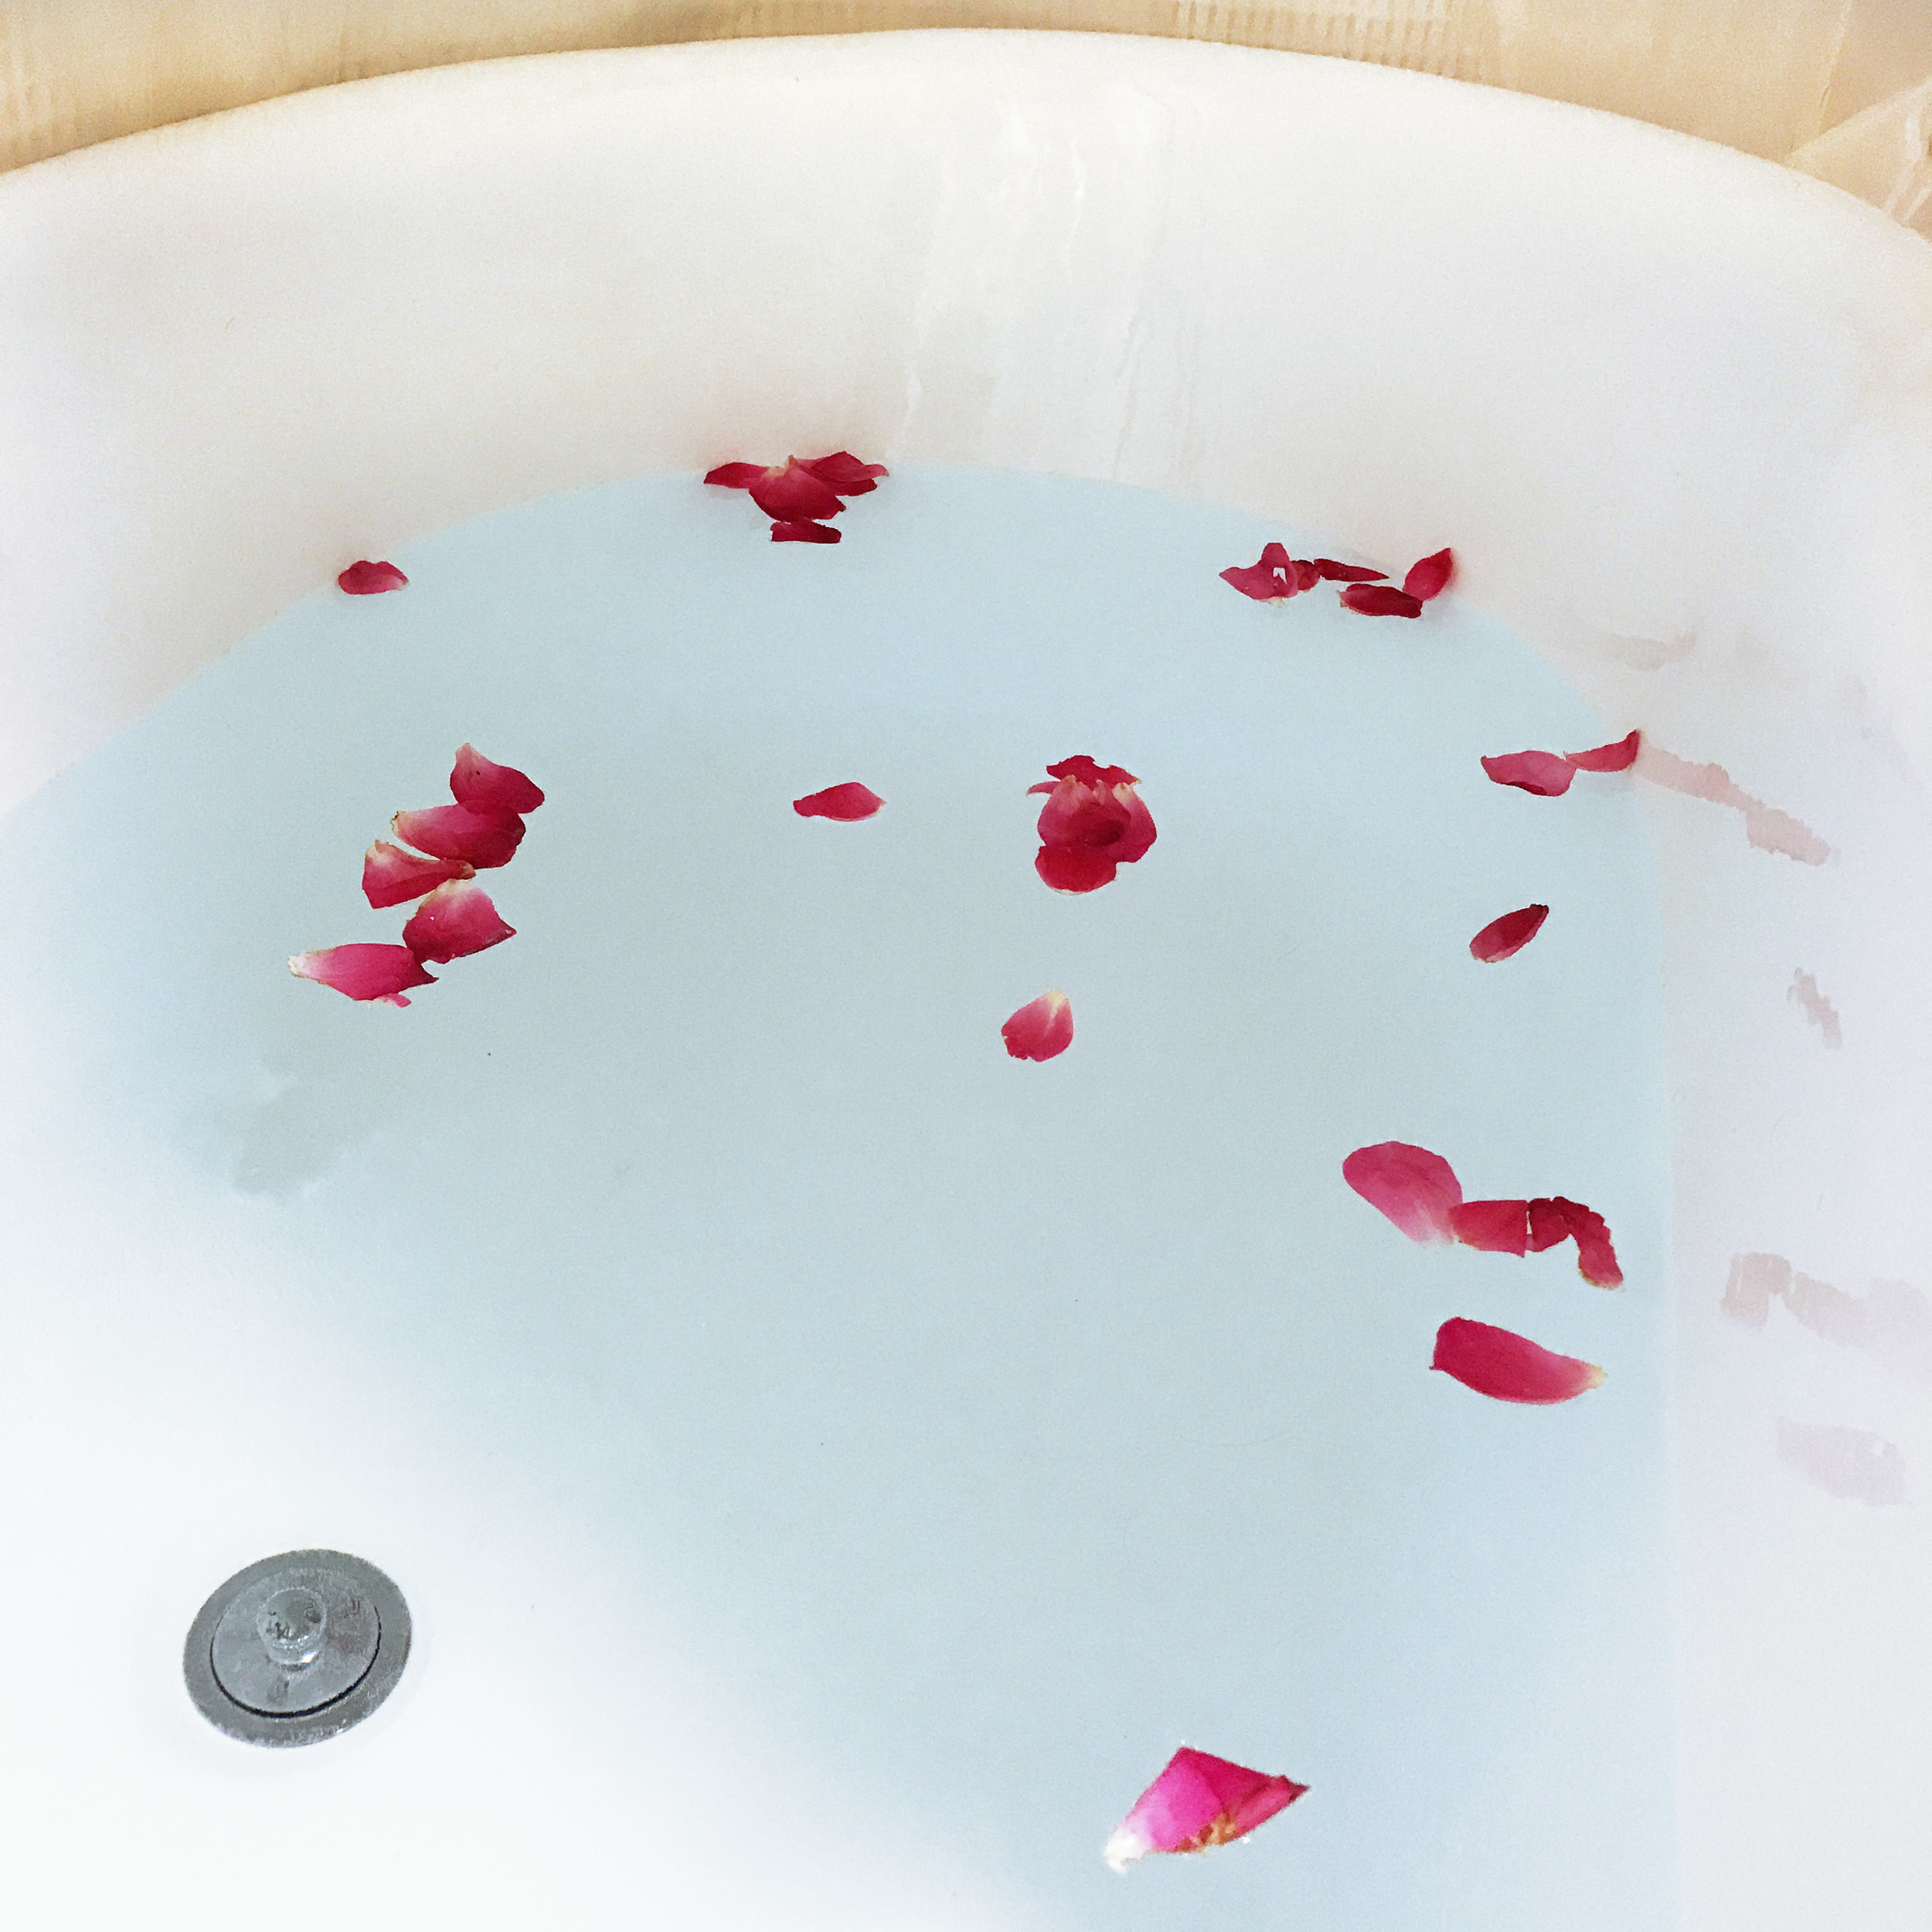 Try adding rose petals!